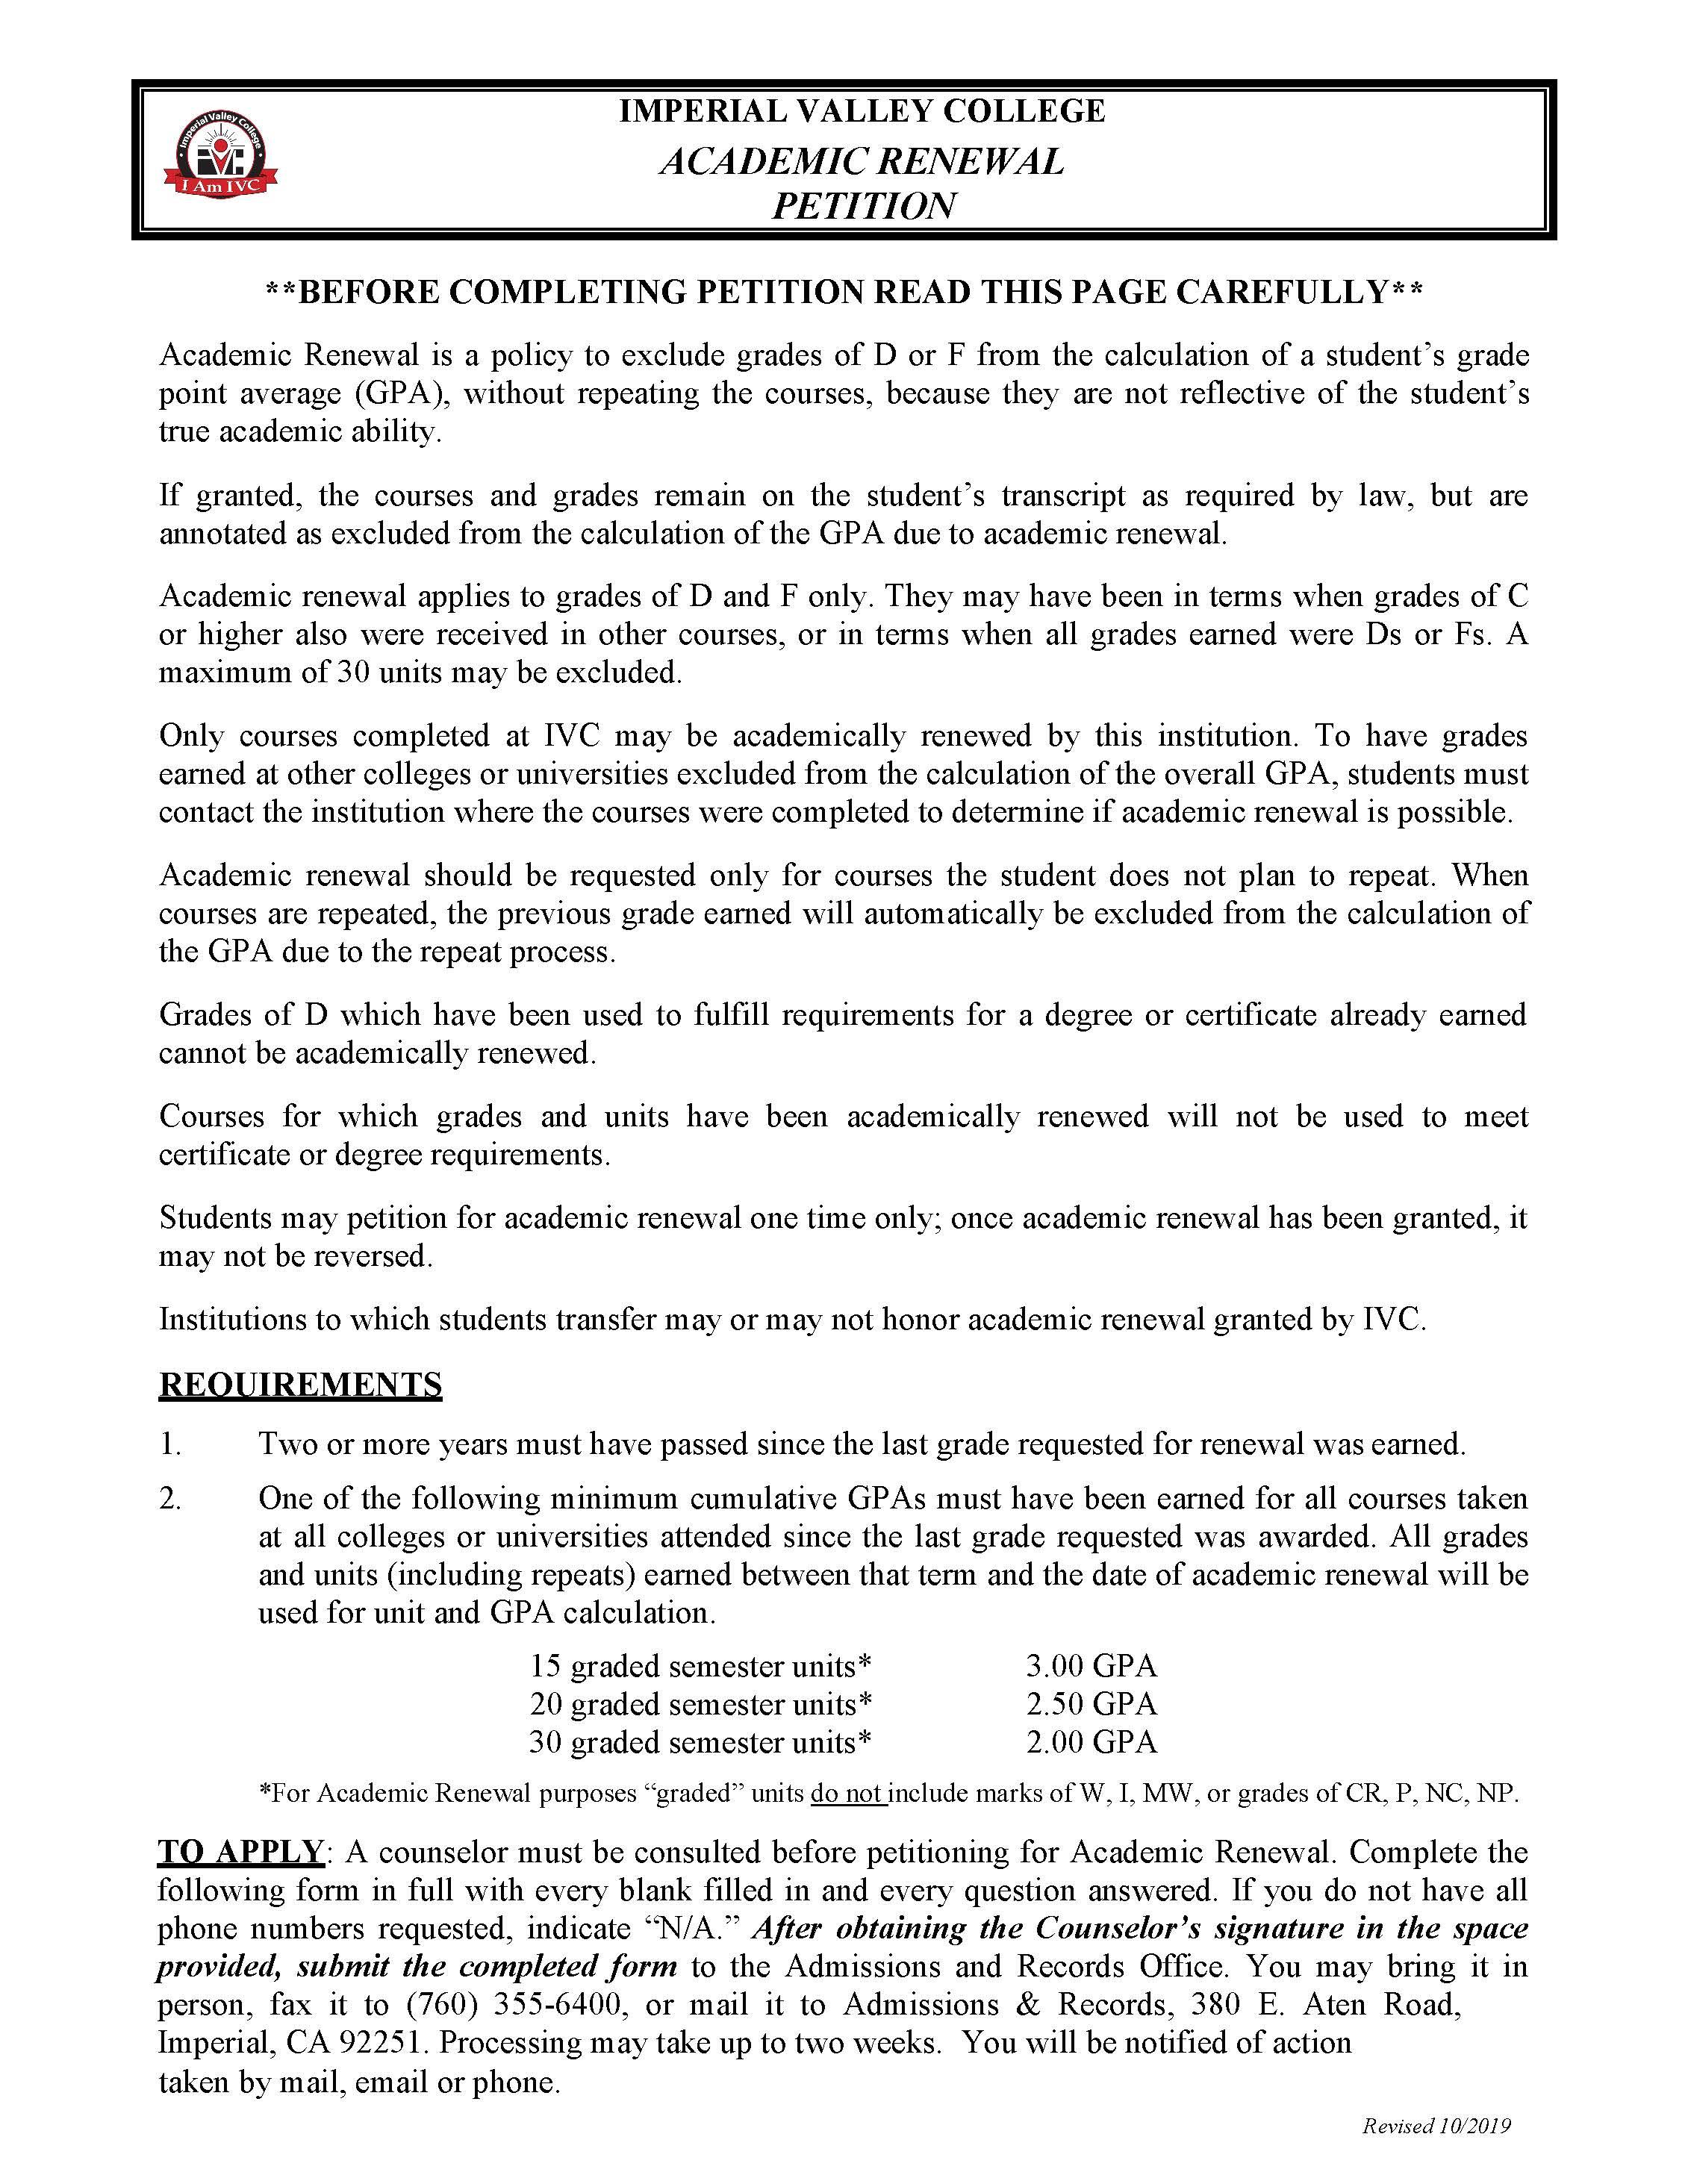 Academic Renewal Petition